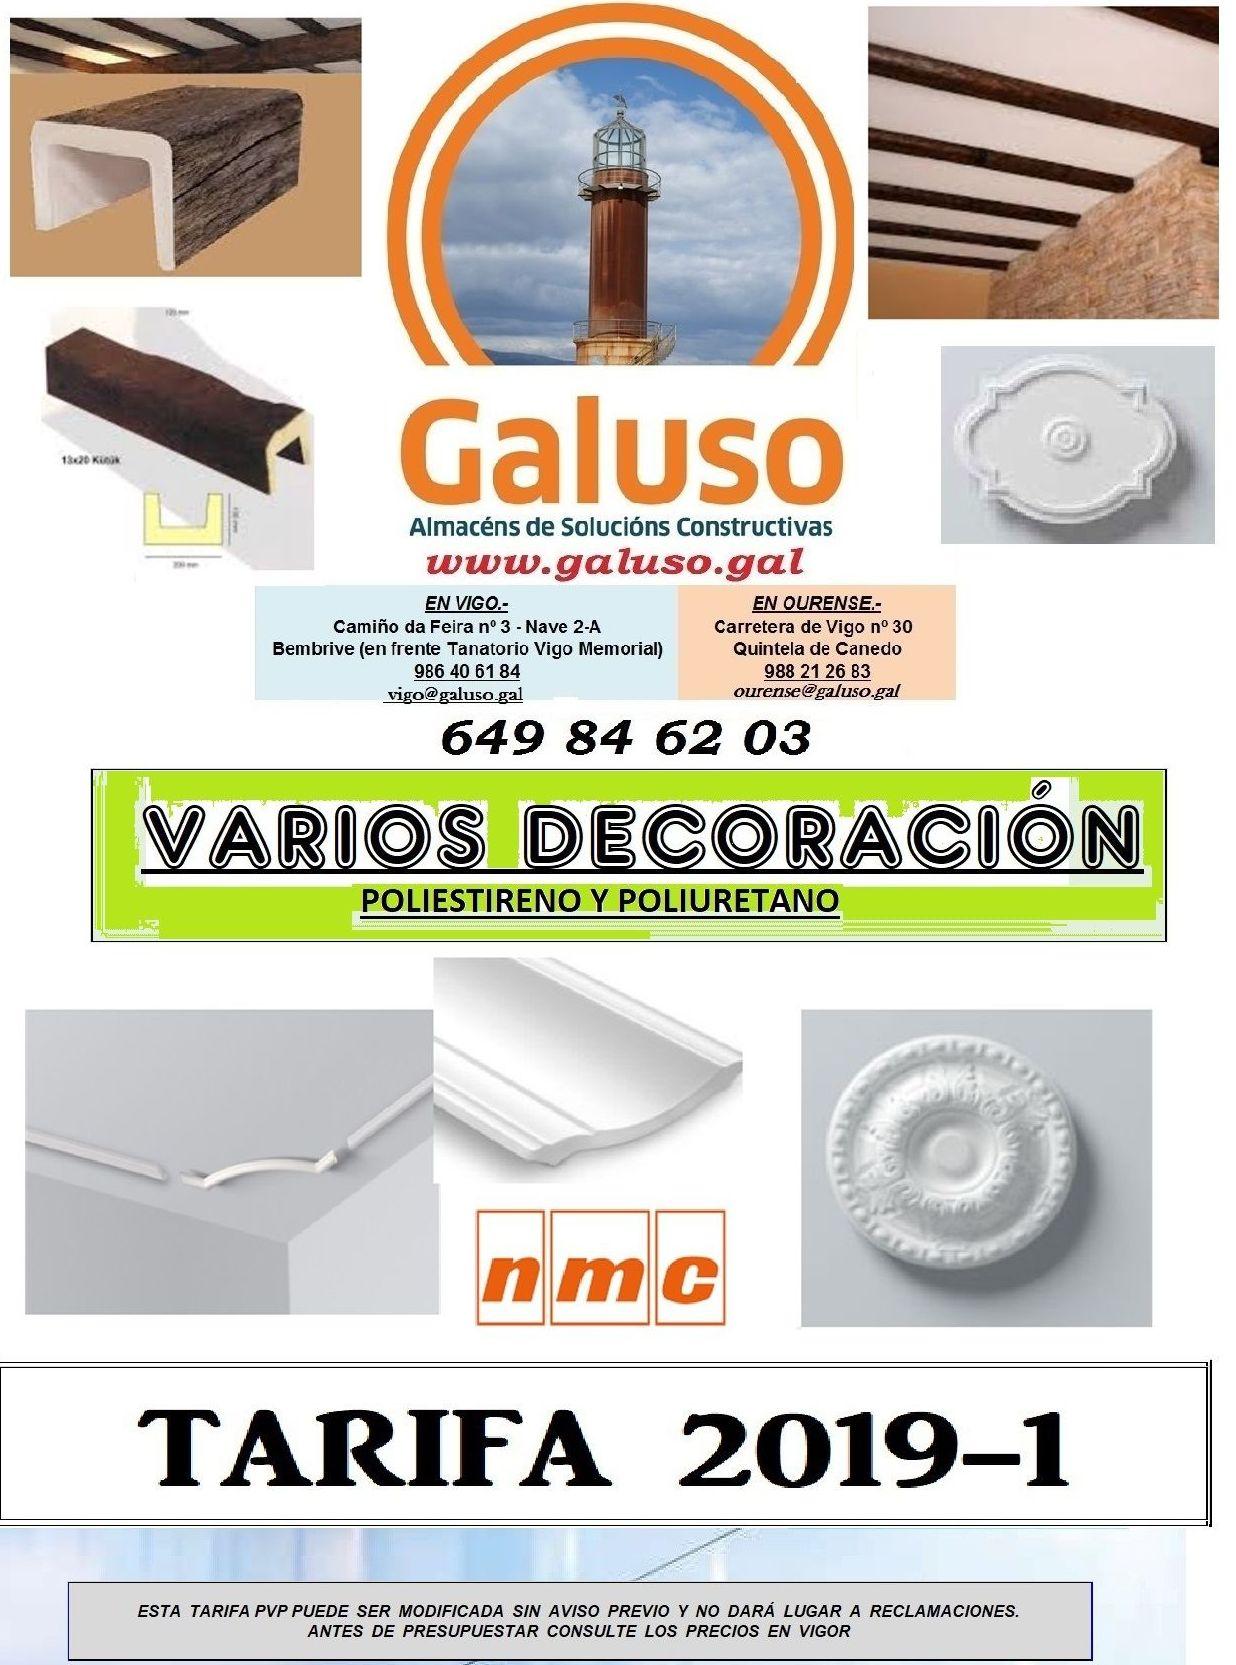 TARIFA 2019 - VARIOS DECORACION: Catálogo de Galuso